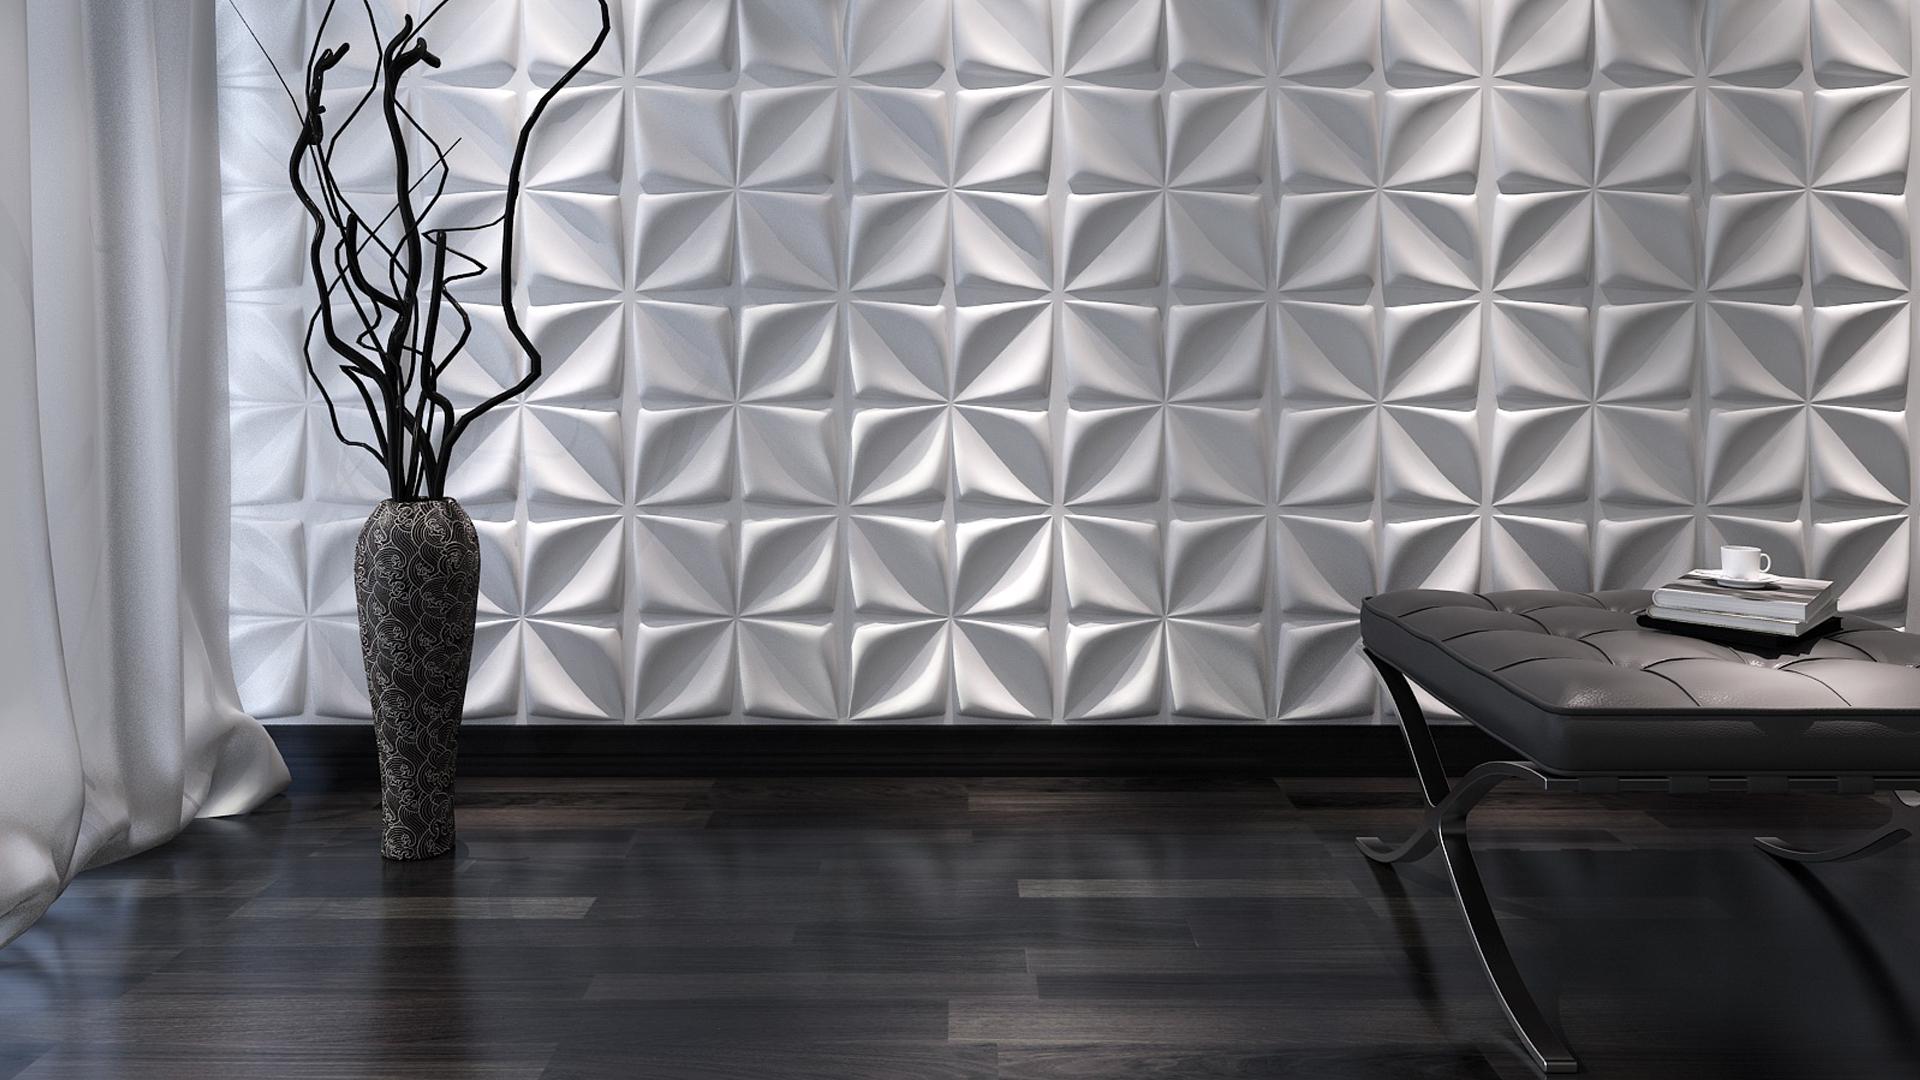 3D Wandpaneele - Aryl - Deckenpaneele - 3D Tapeten